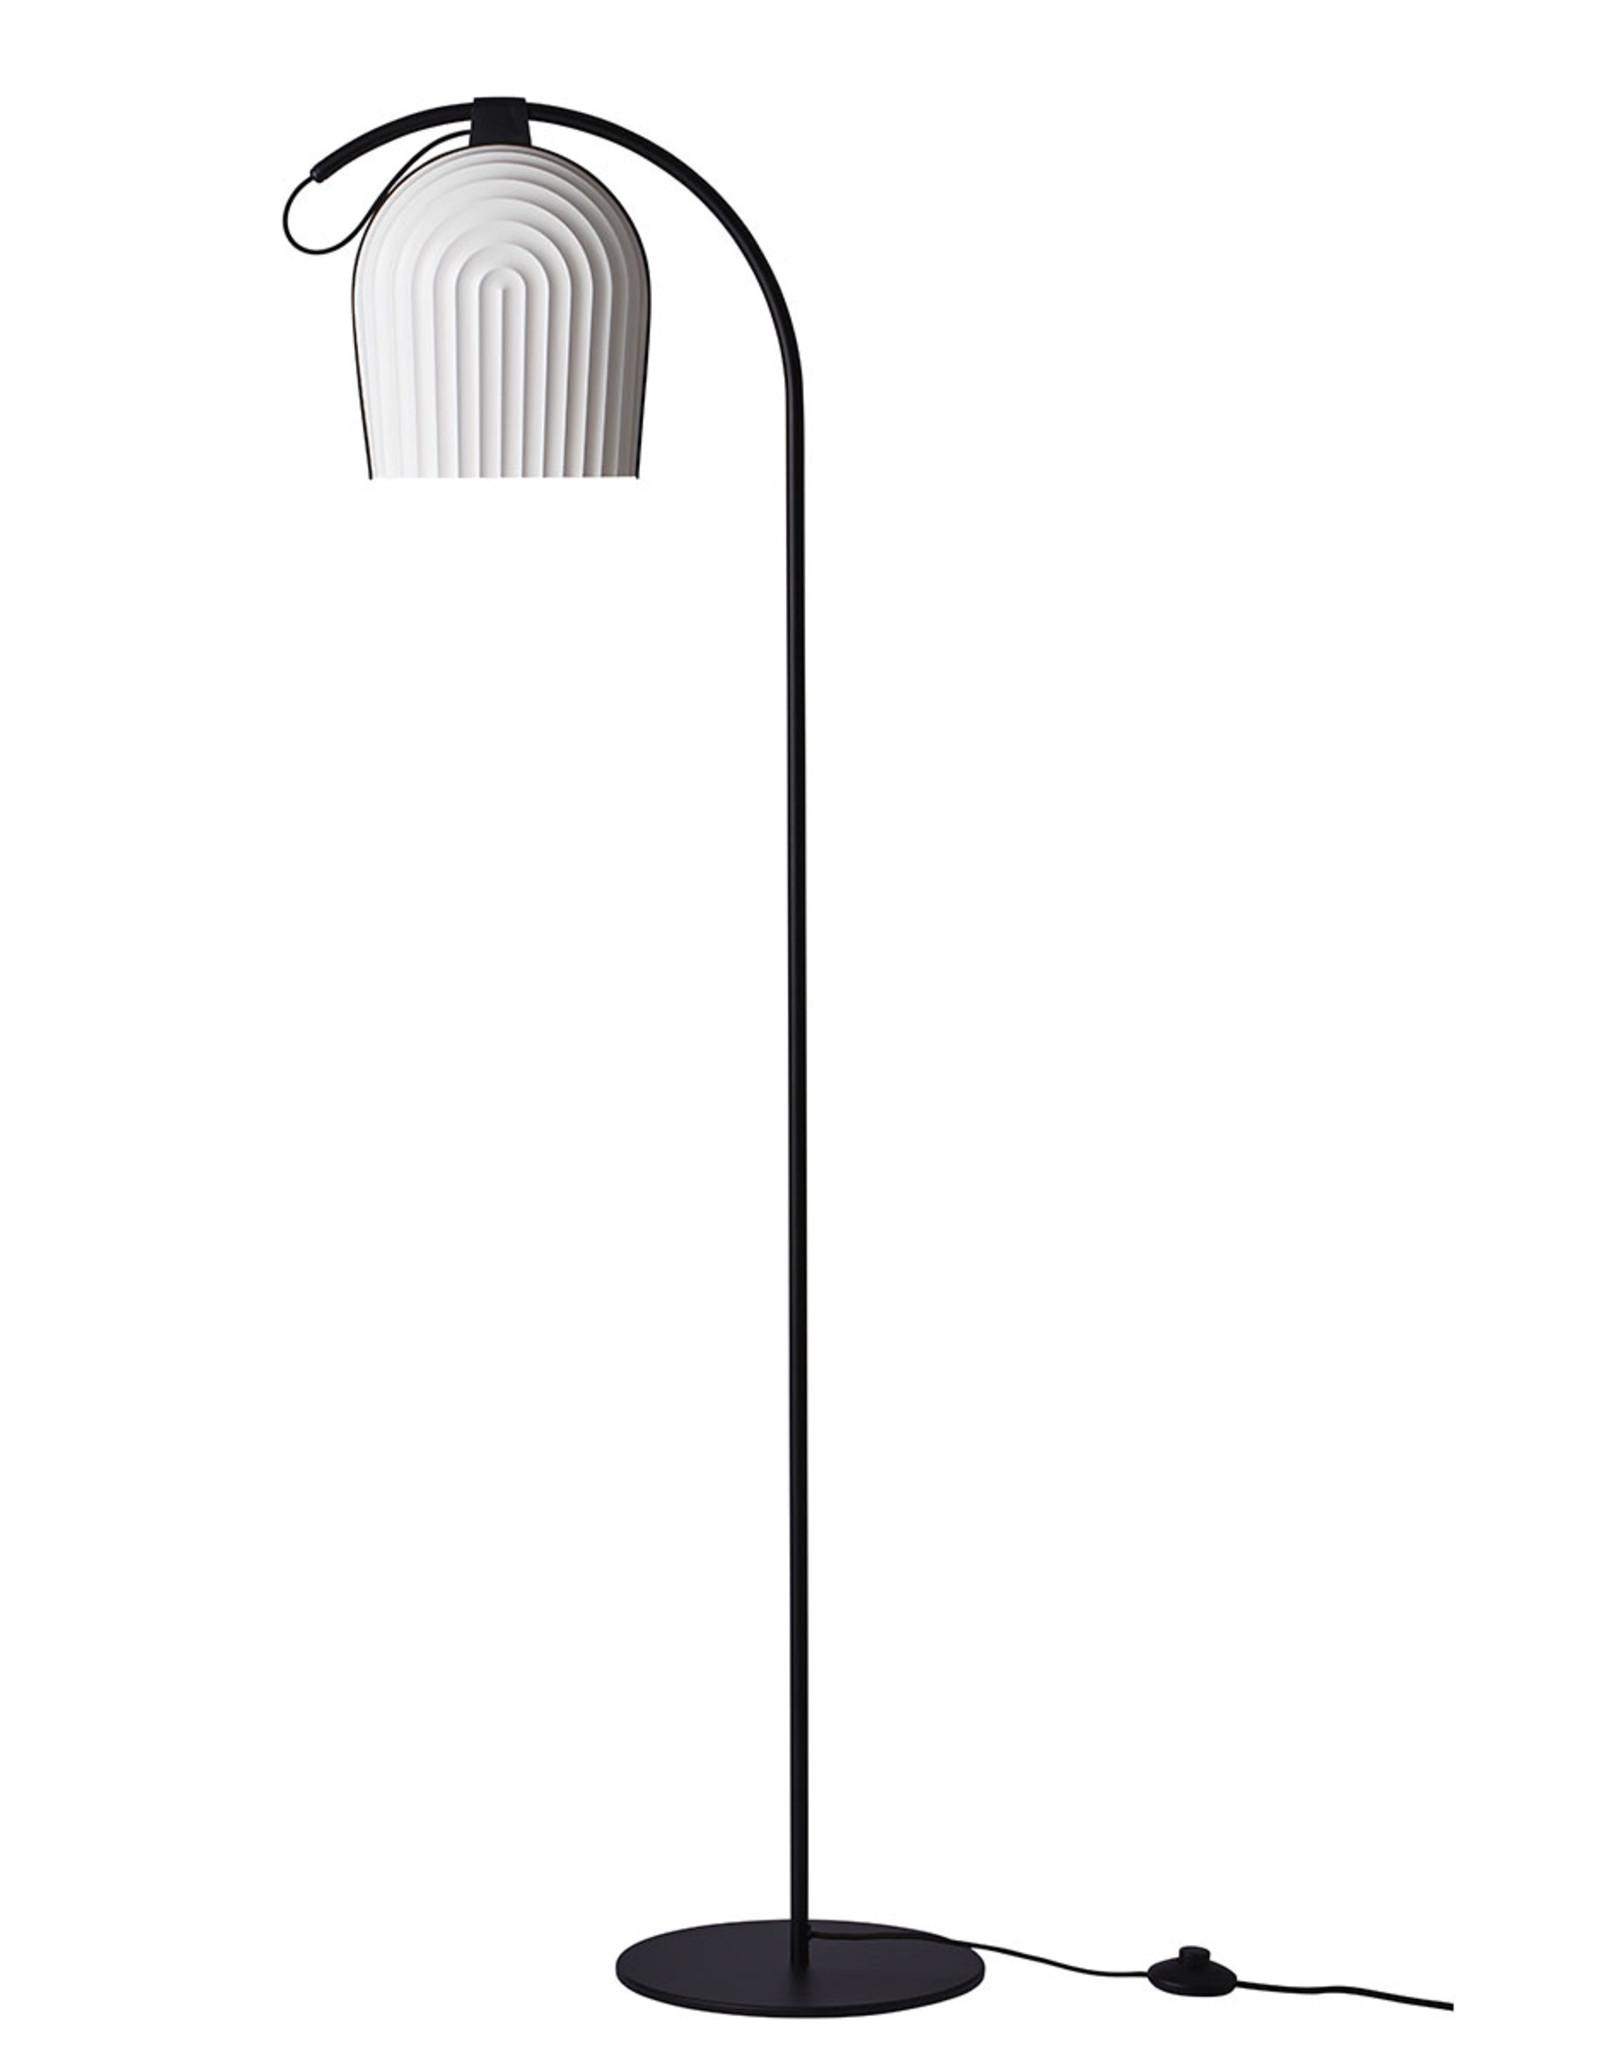 Arc 387 floor light by N.Neergaard & M.Hesseldahl | Plastic | Black | Dia28cm x H142cm | 1x E27 800 LM max. 15W LED bulb required